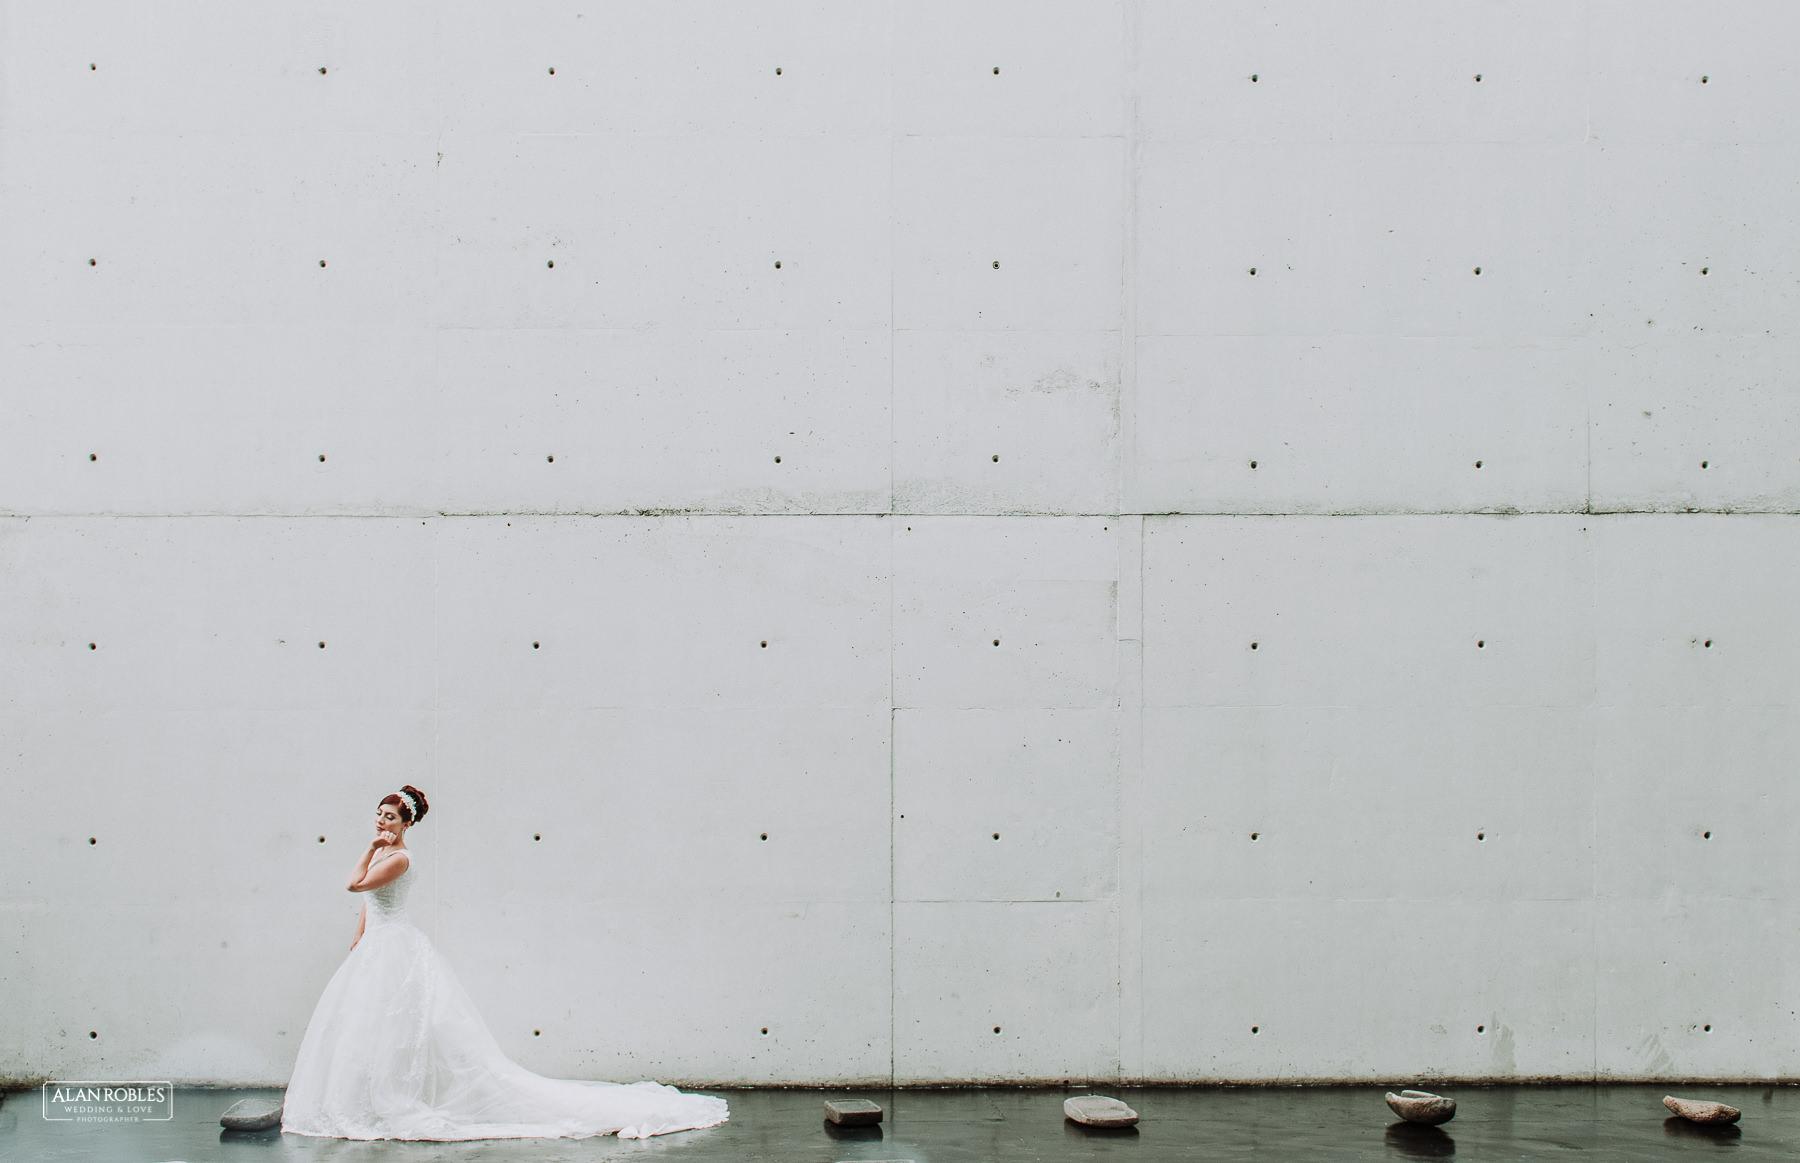 Alan Robles fotografo de bodas guadalajara - LyP Hotel Demetria-40